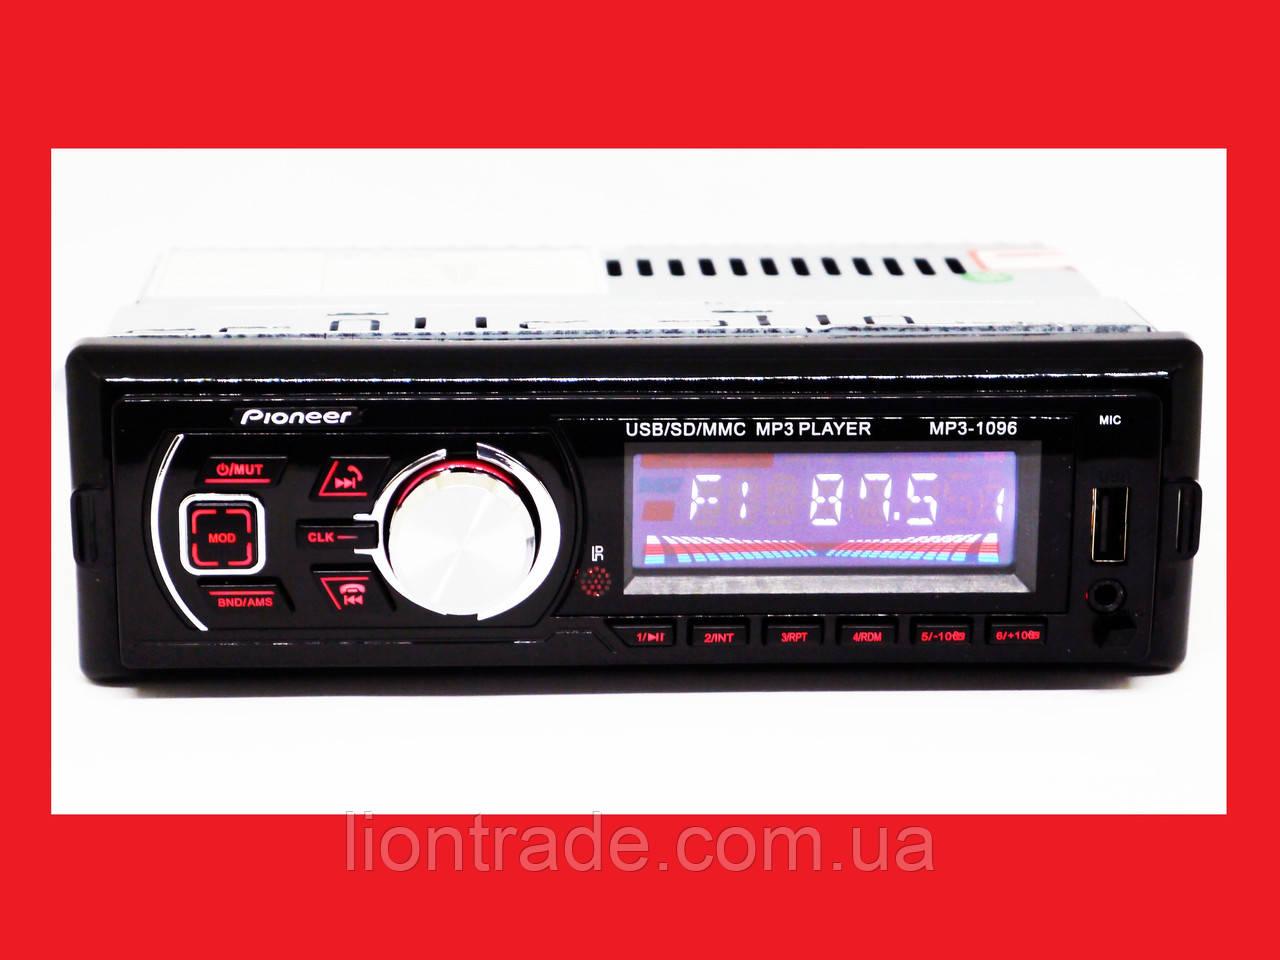 Автомагнітола Pioneer 1096BT - Bluetooth MP3 Player, FM, USB, microSD, AUX - ЗНІМНА панель